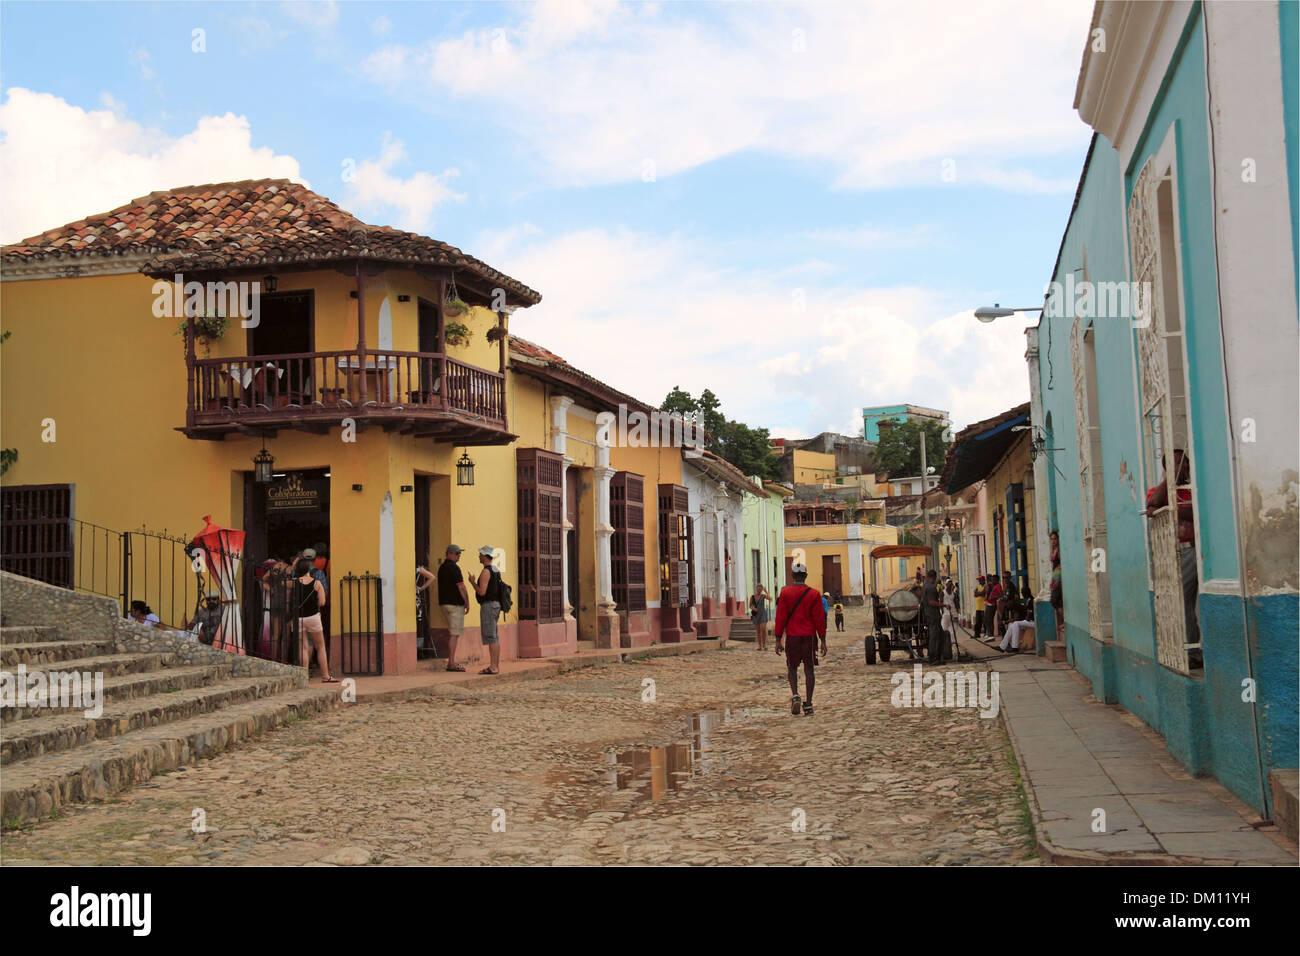 Casa de los Conspiradores, Calle Cristo, Plaza Mayor, Trinidad, Sancti Spiritus province, Cuba, Caribbean Sea, Central Stock Photo